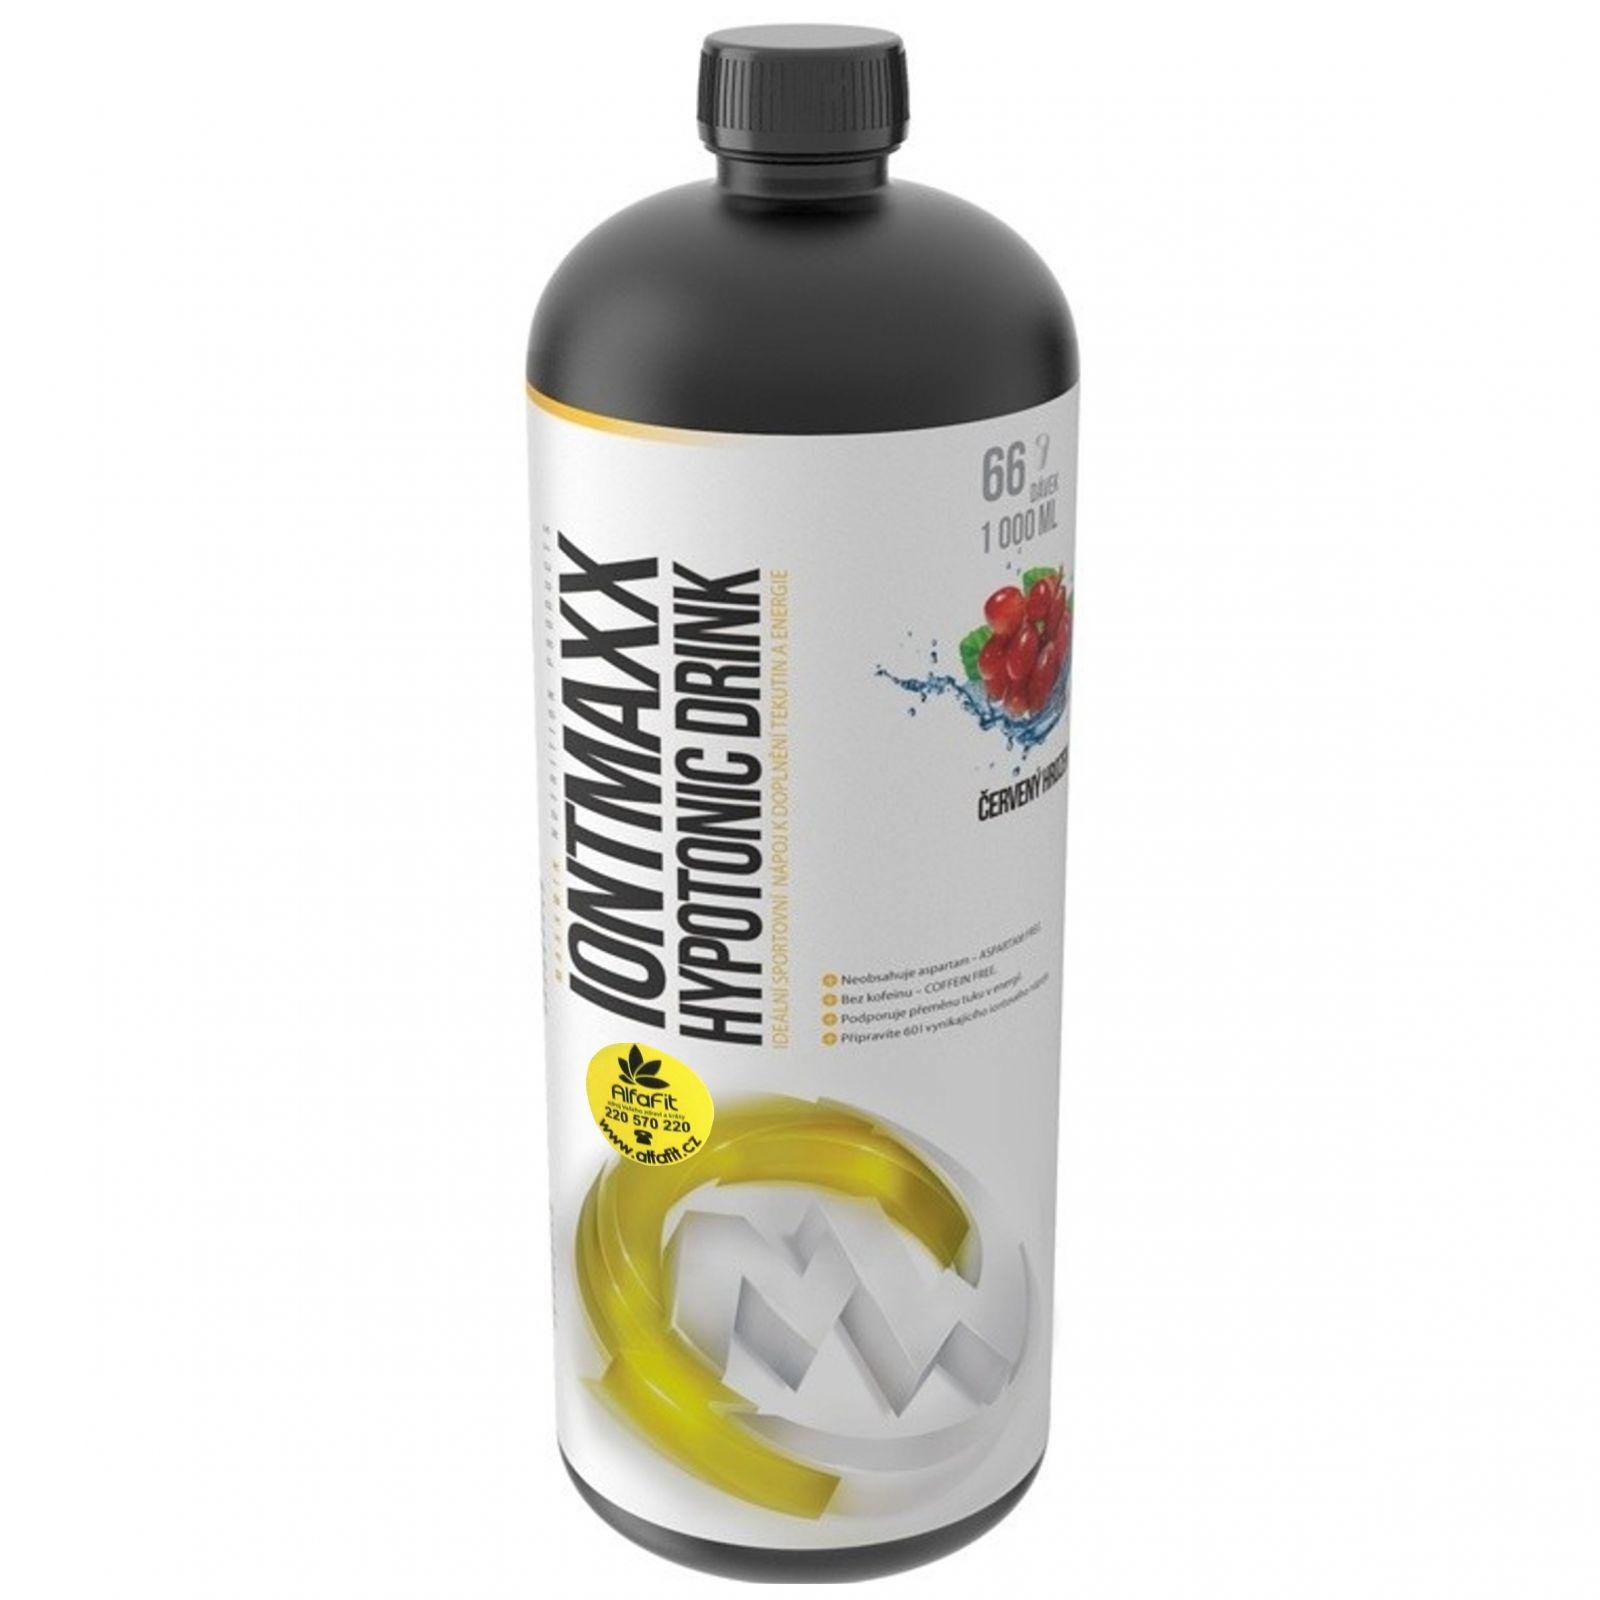 Maxxwin Hypotonic Iontdrink 1000 ml